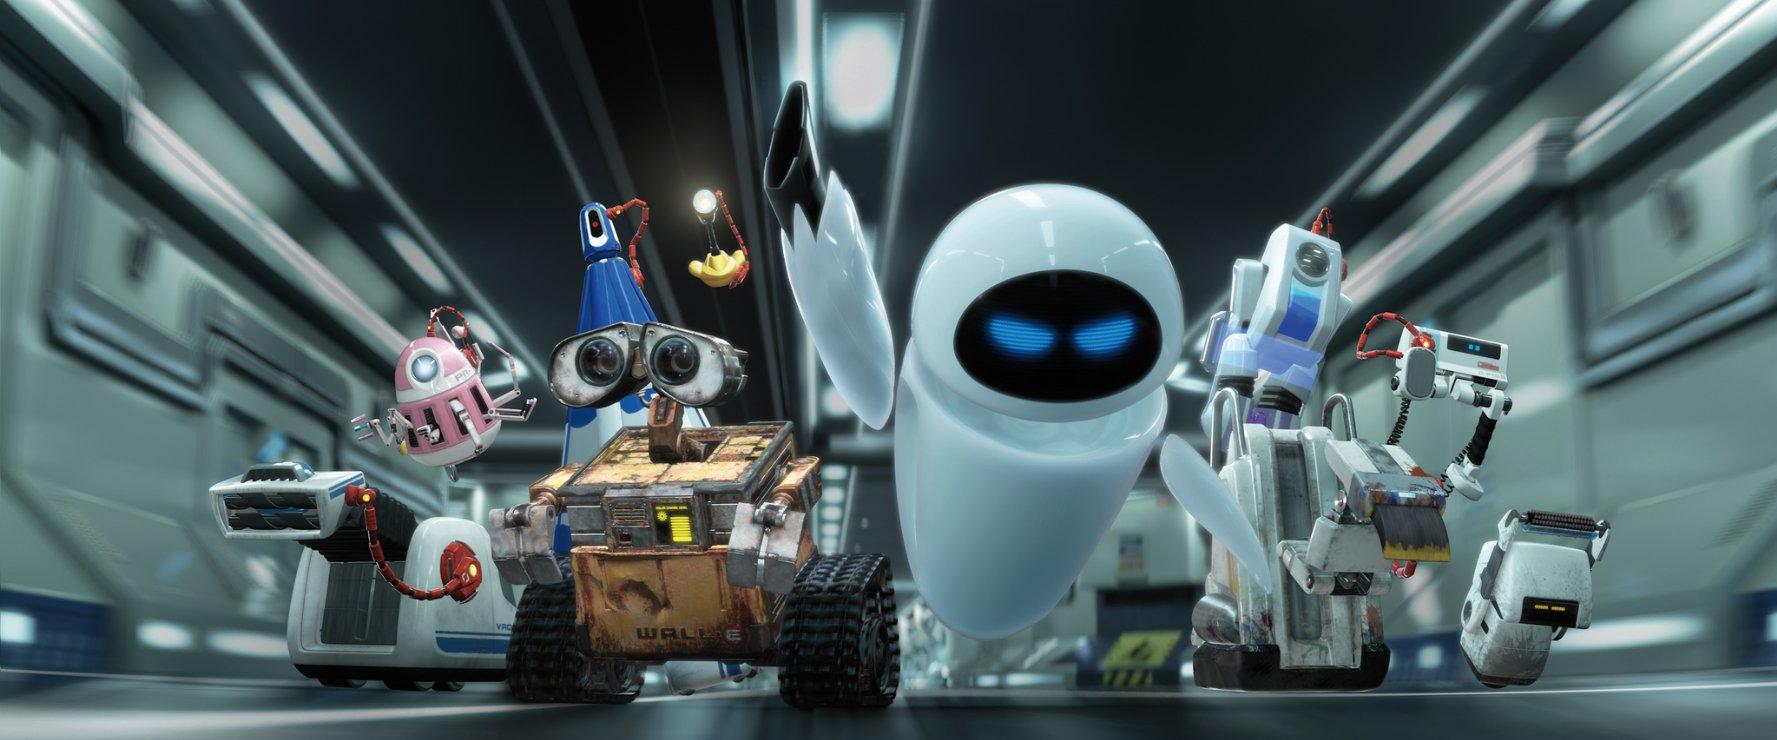 2_WALL_E_imdb.jpg